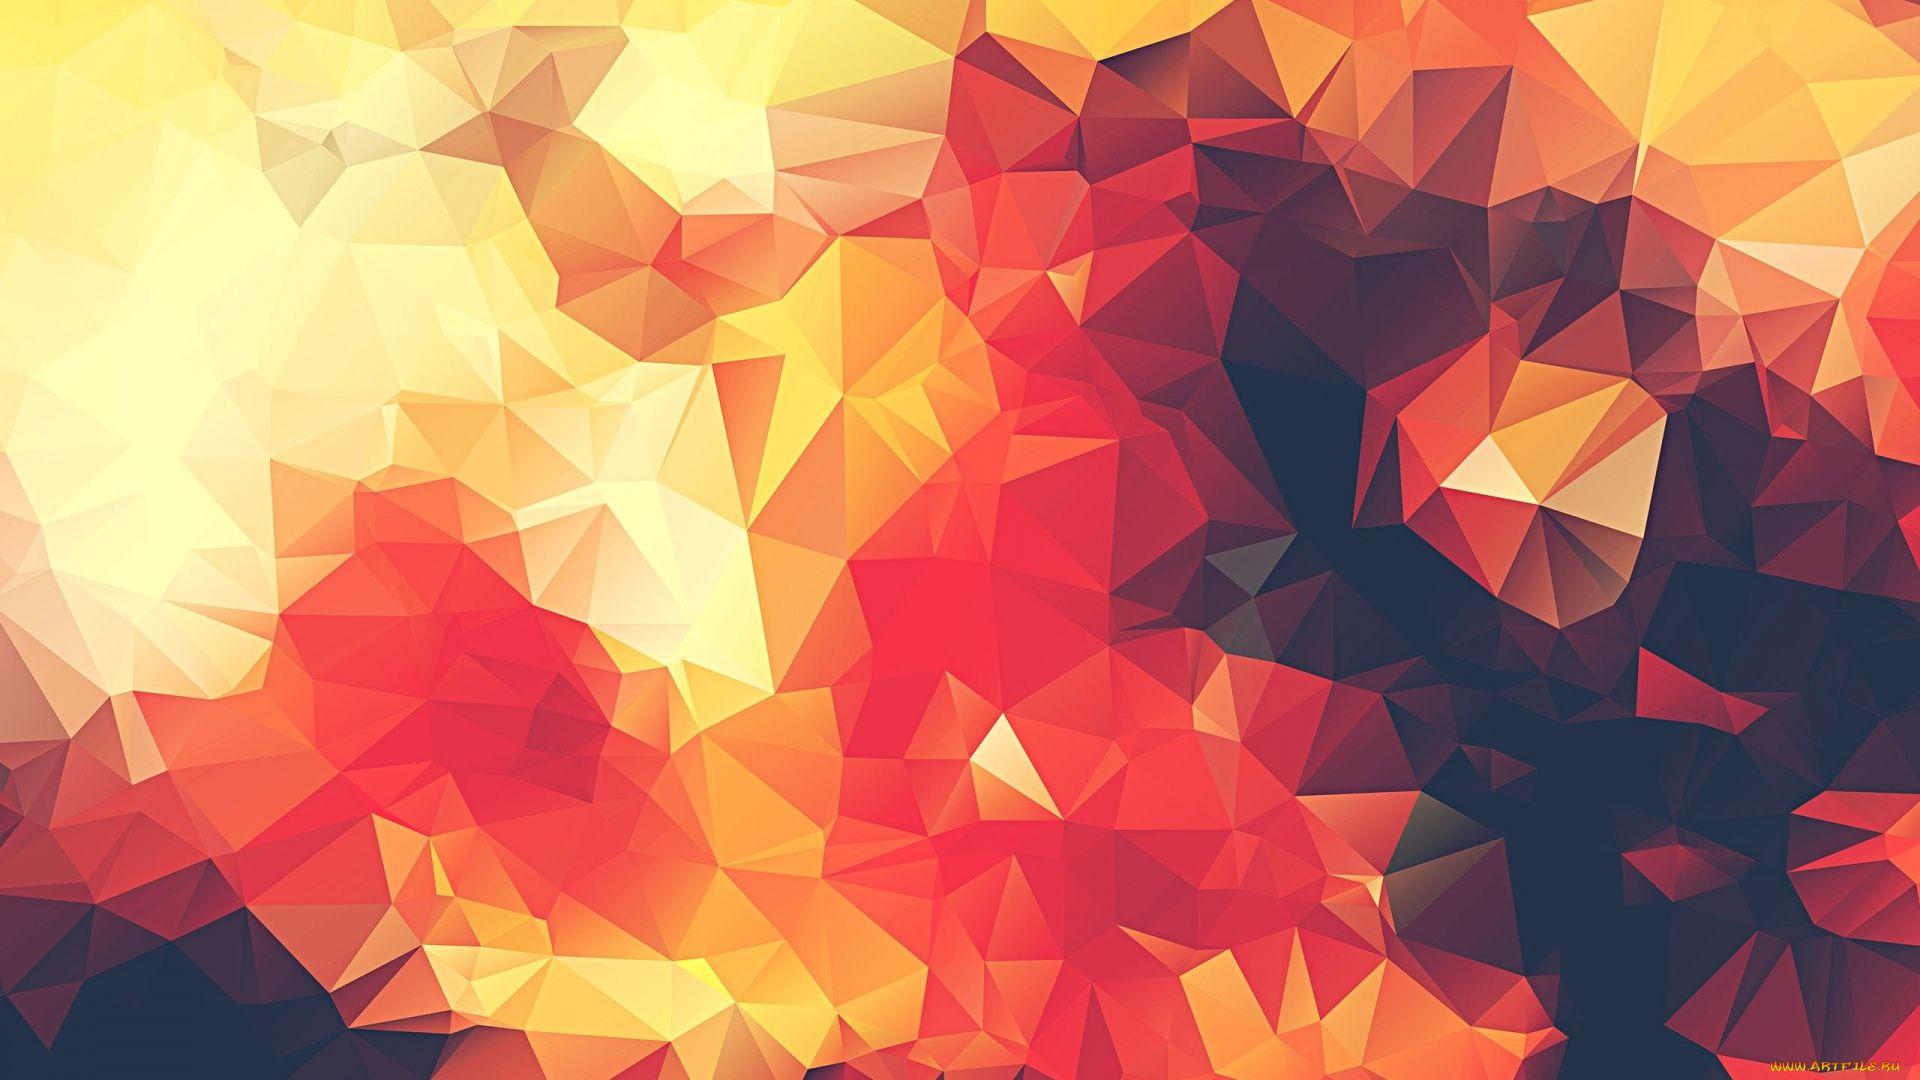 Cool Vector wallpaper hd